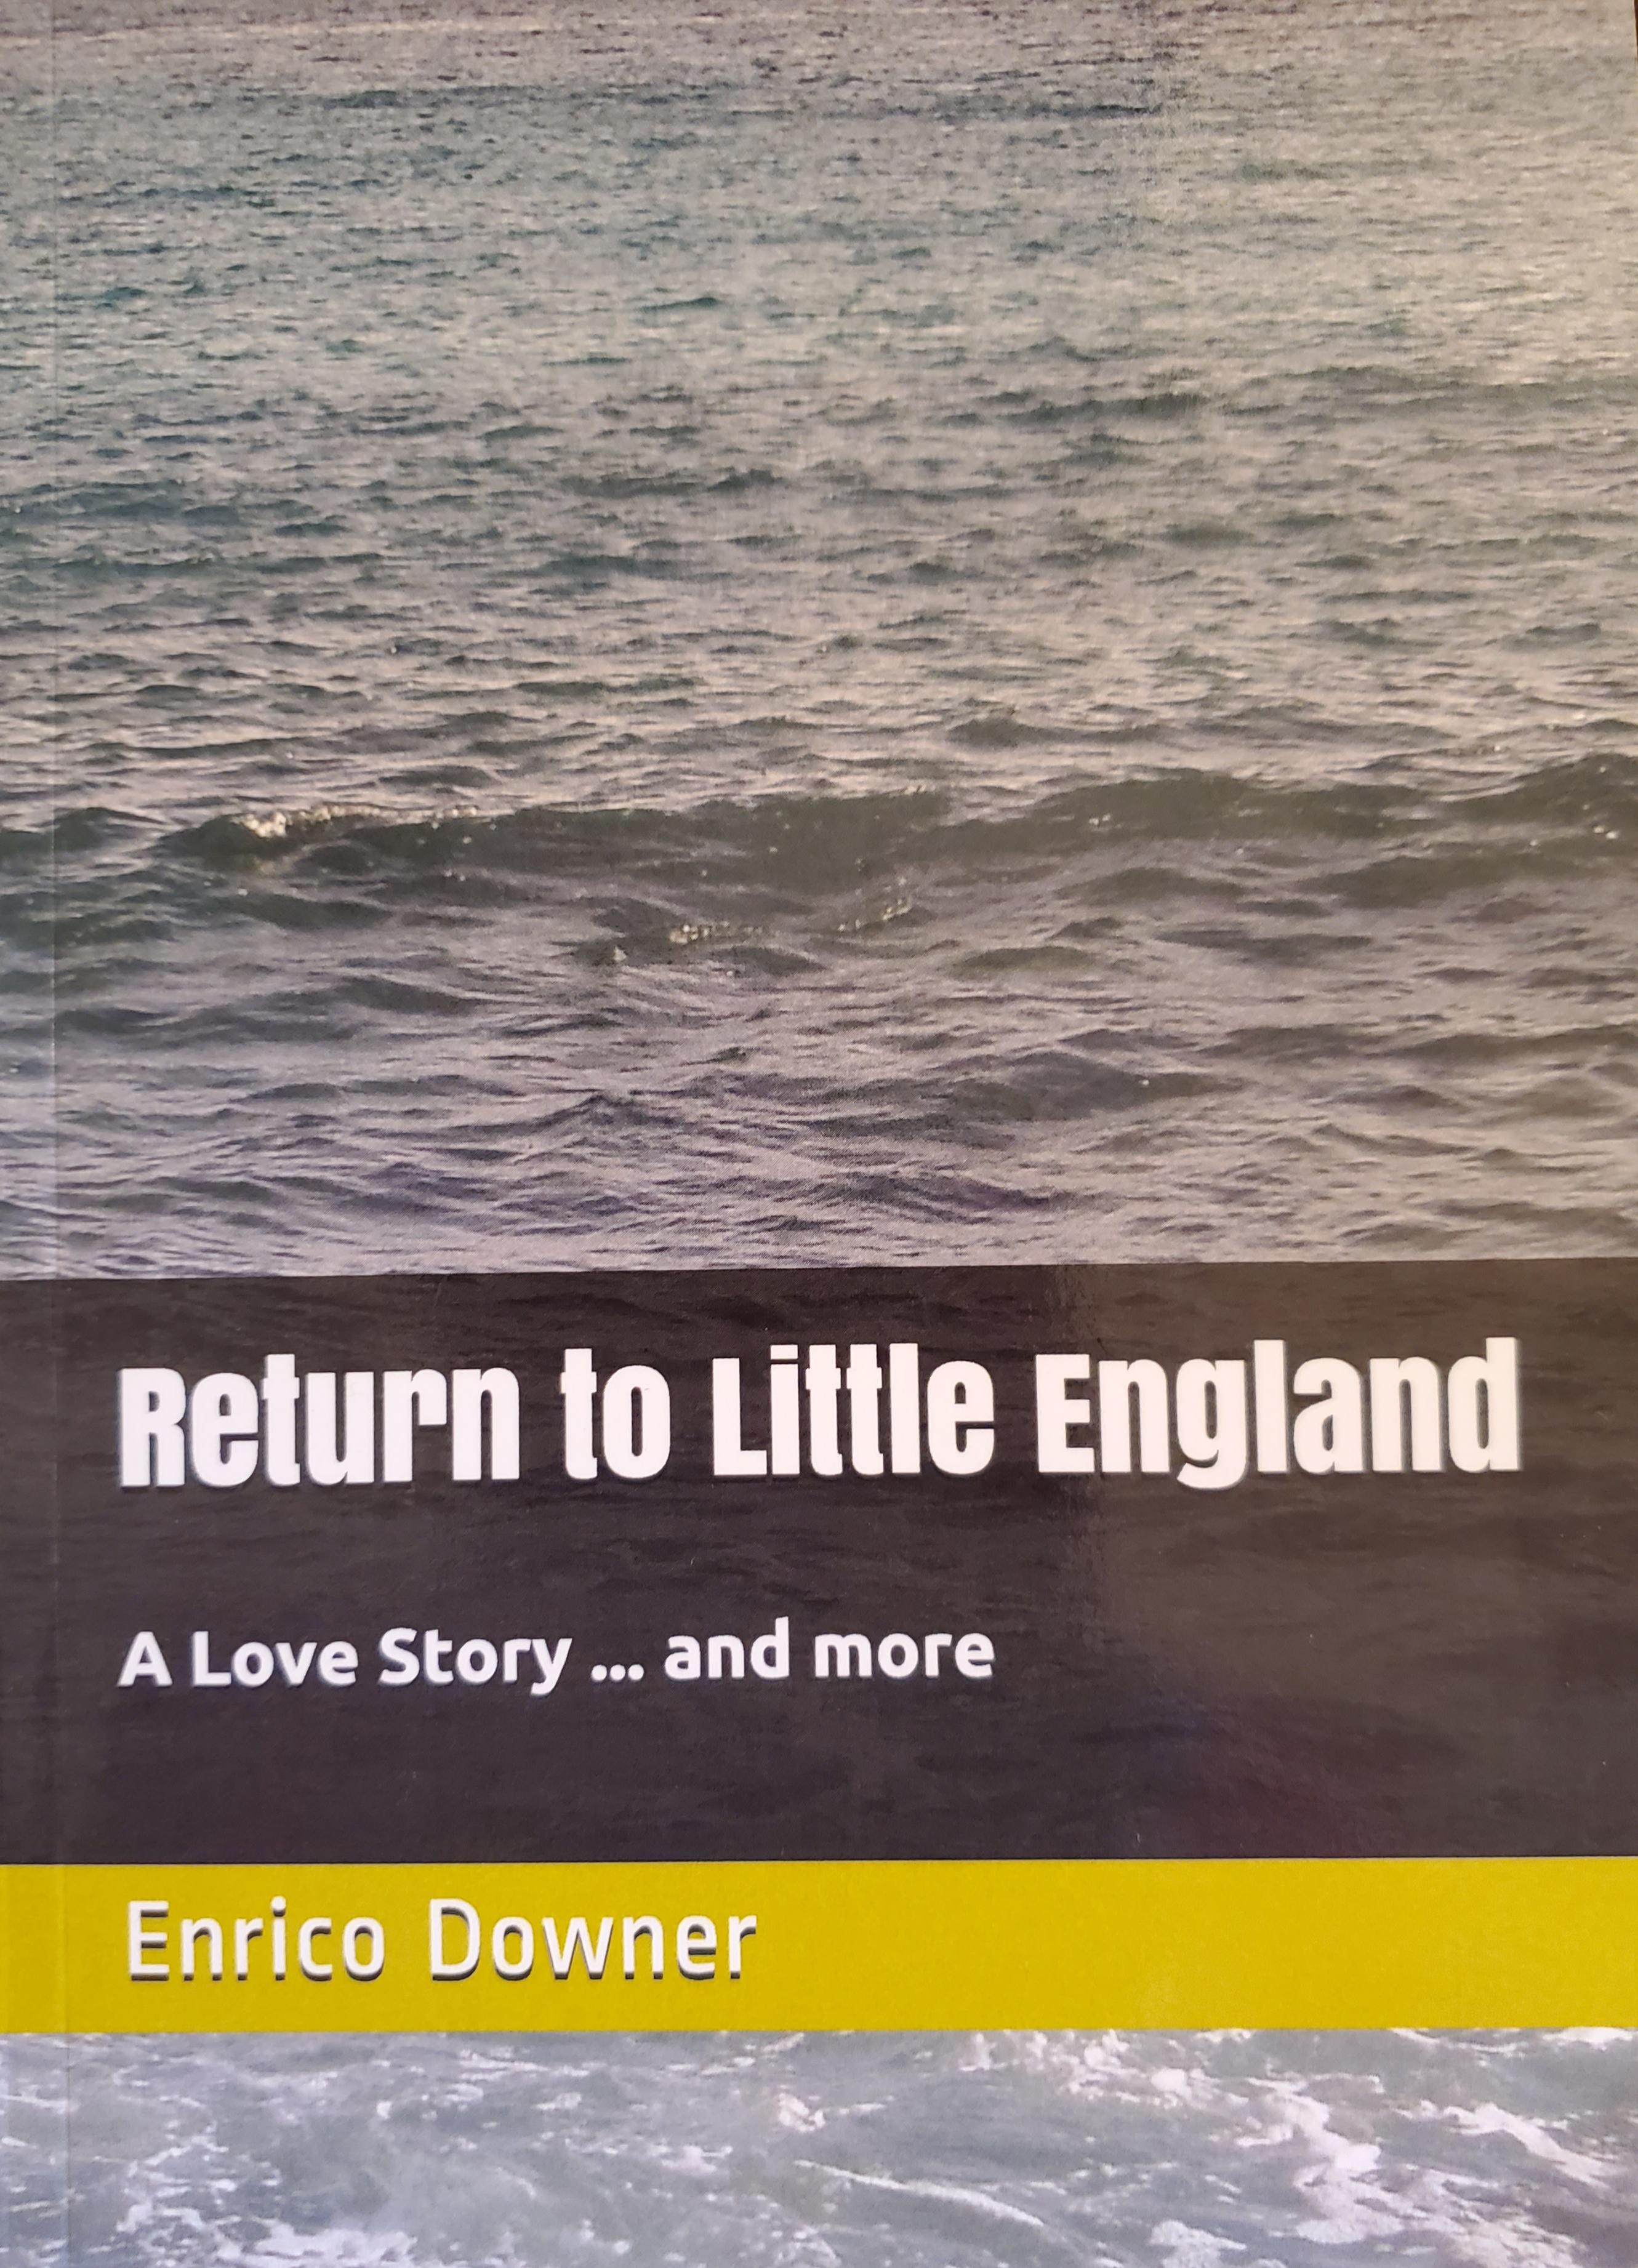 Return Little England 20190808_101450